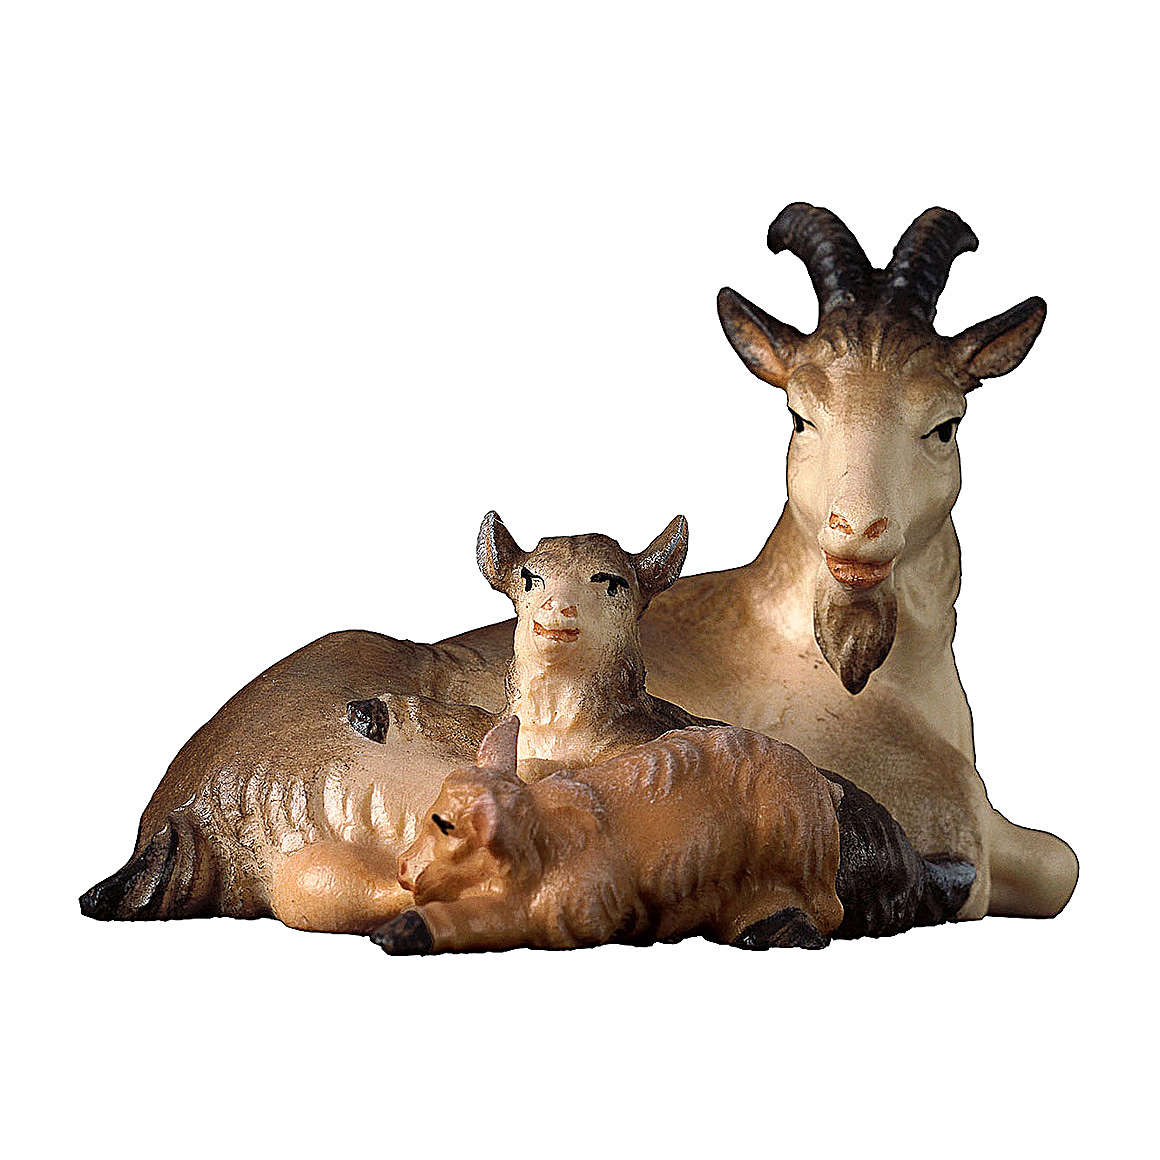 Capra sdraiata con due caprette presepe Original legno dipinto Valgardena 10 cm 4